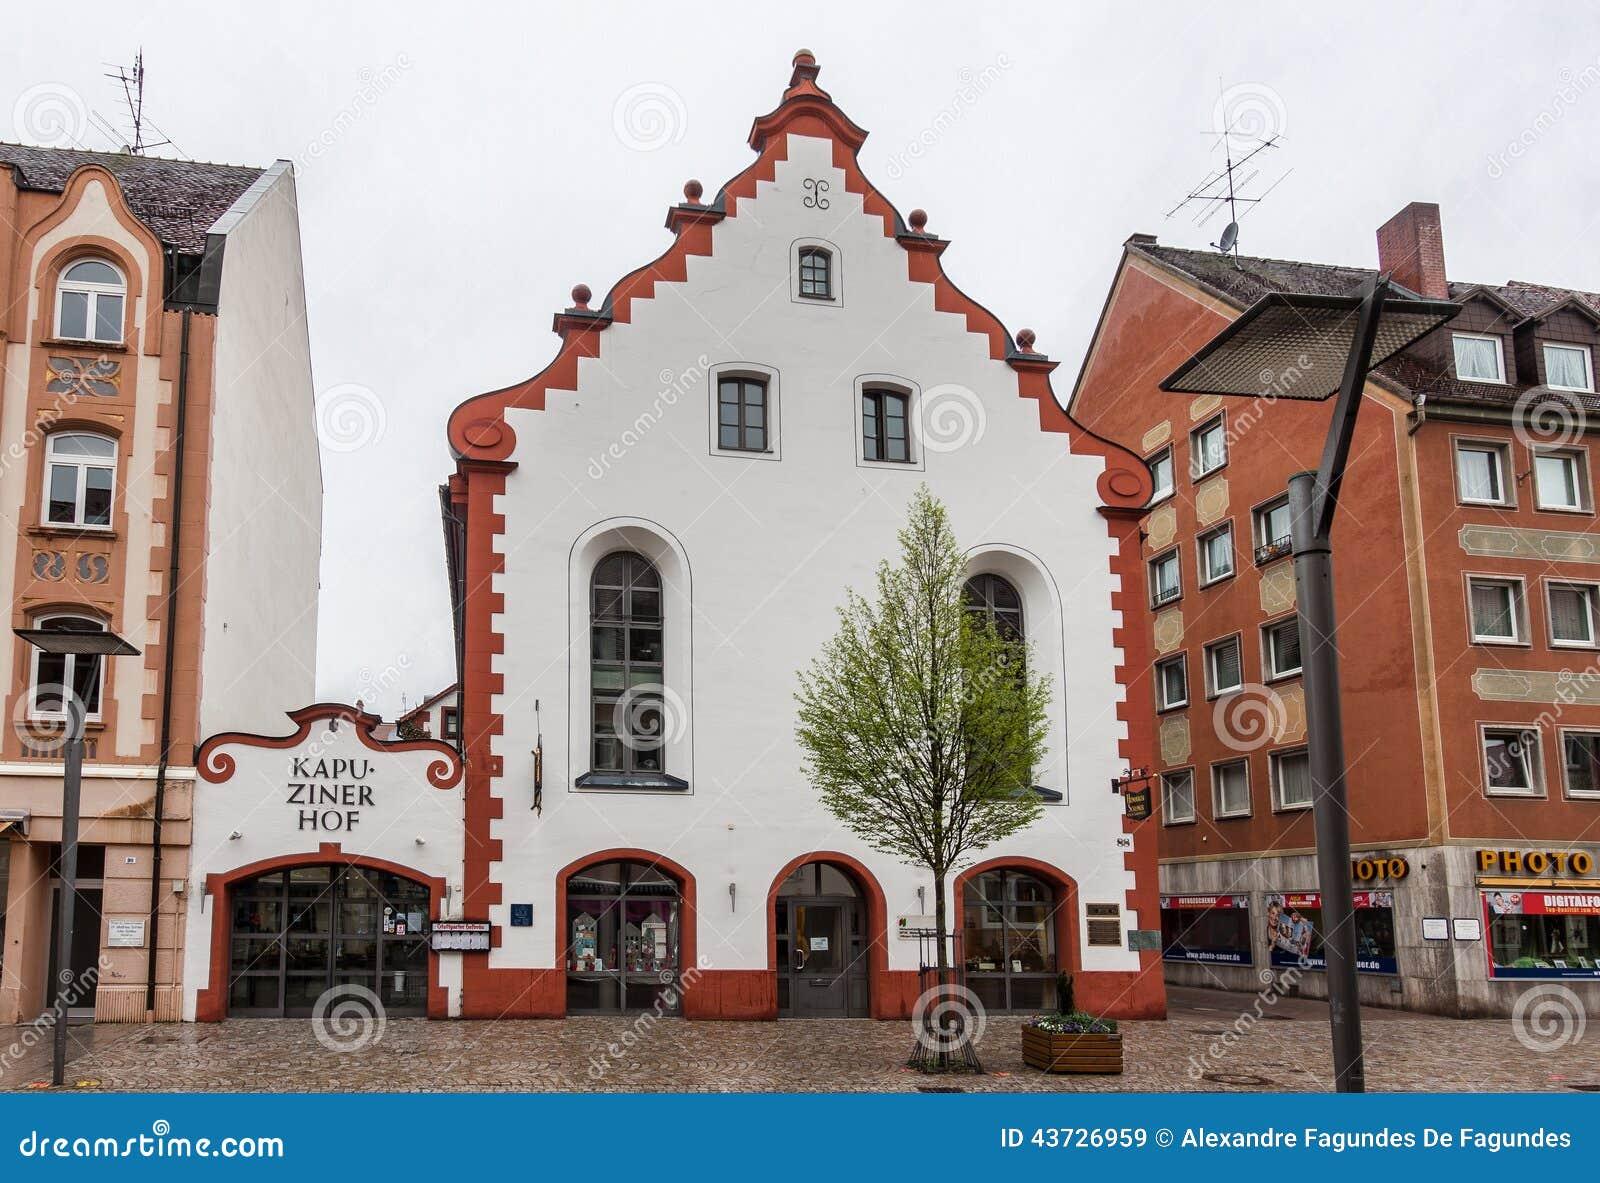 villingen schwenningen germany editorial stock image image of villingen kapuzinerhof 43726959. Black Bedroom Furniture Sets. Home Design Ideas